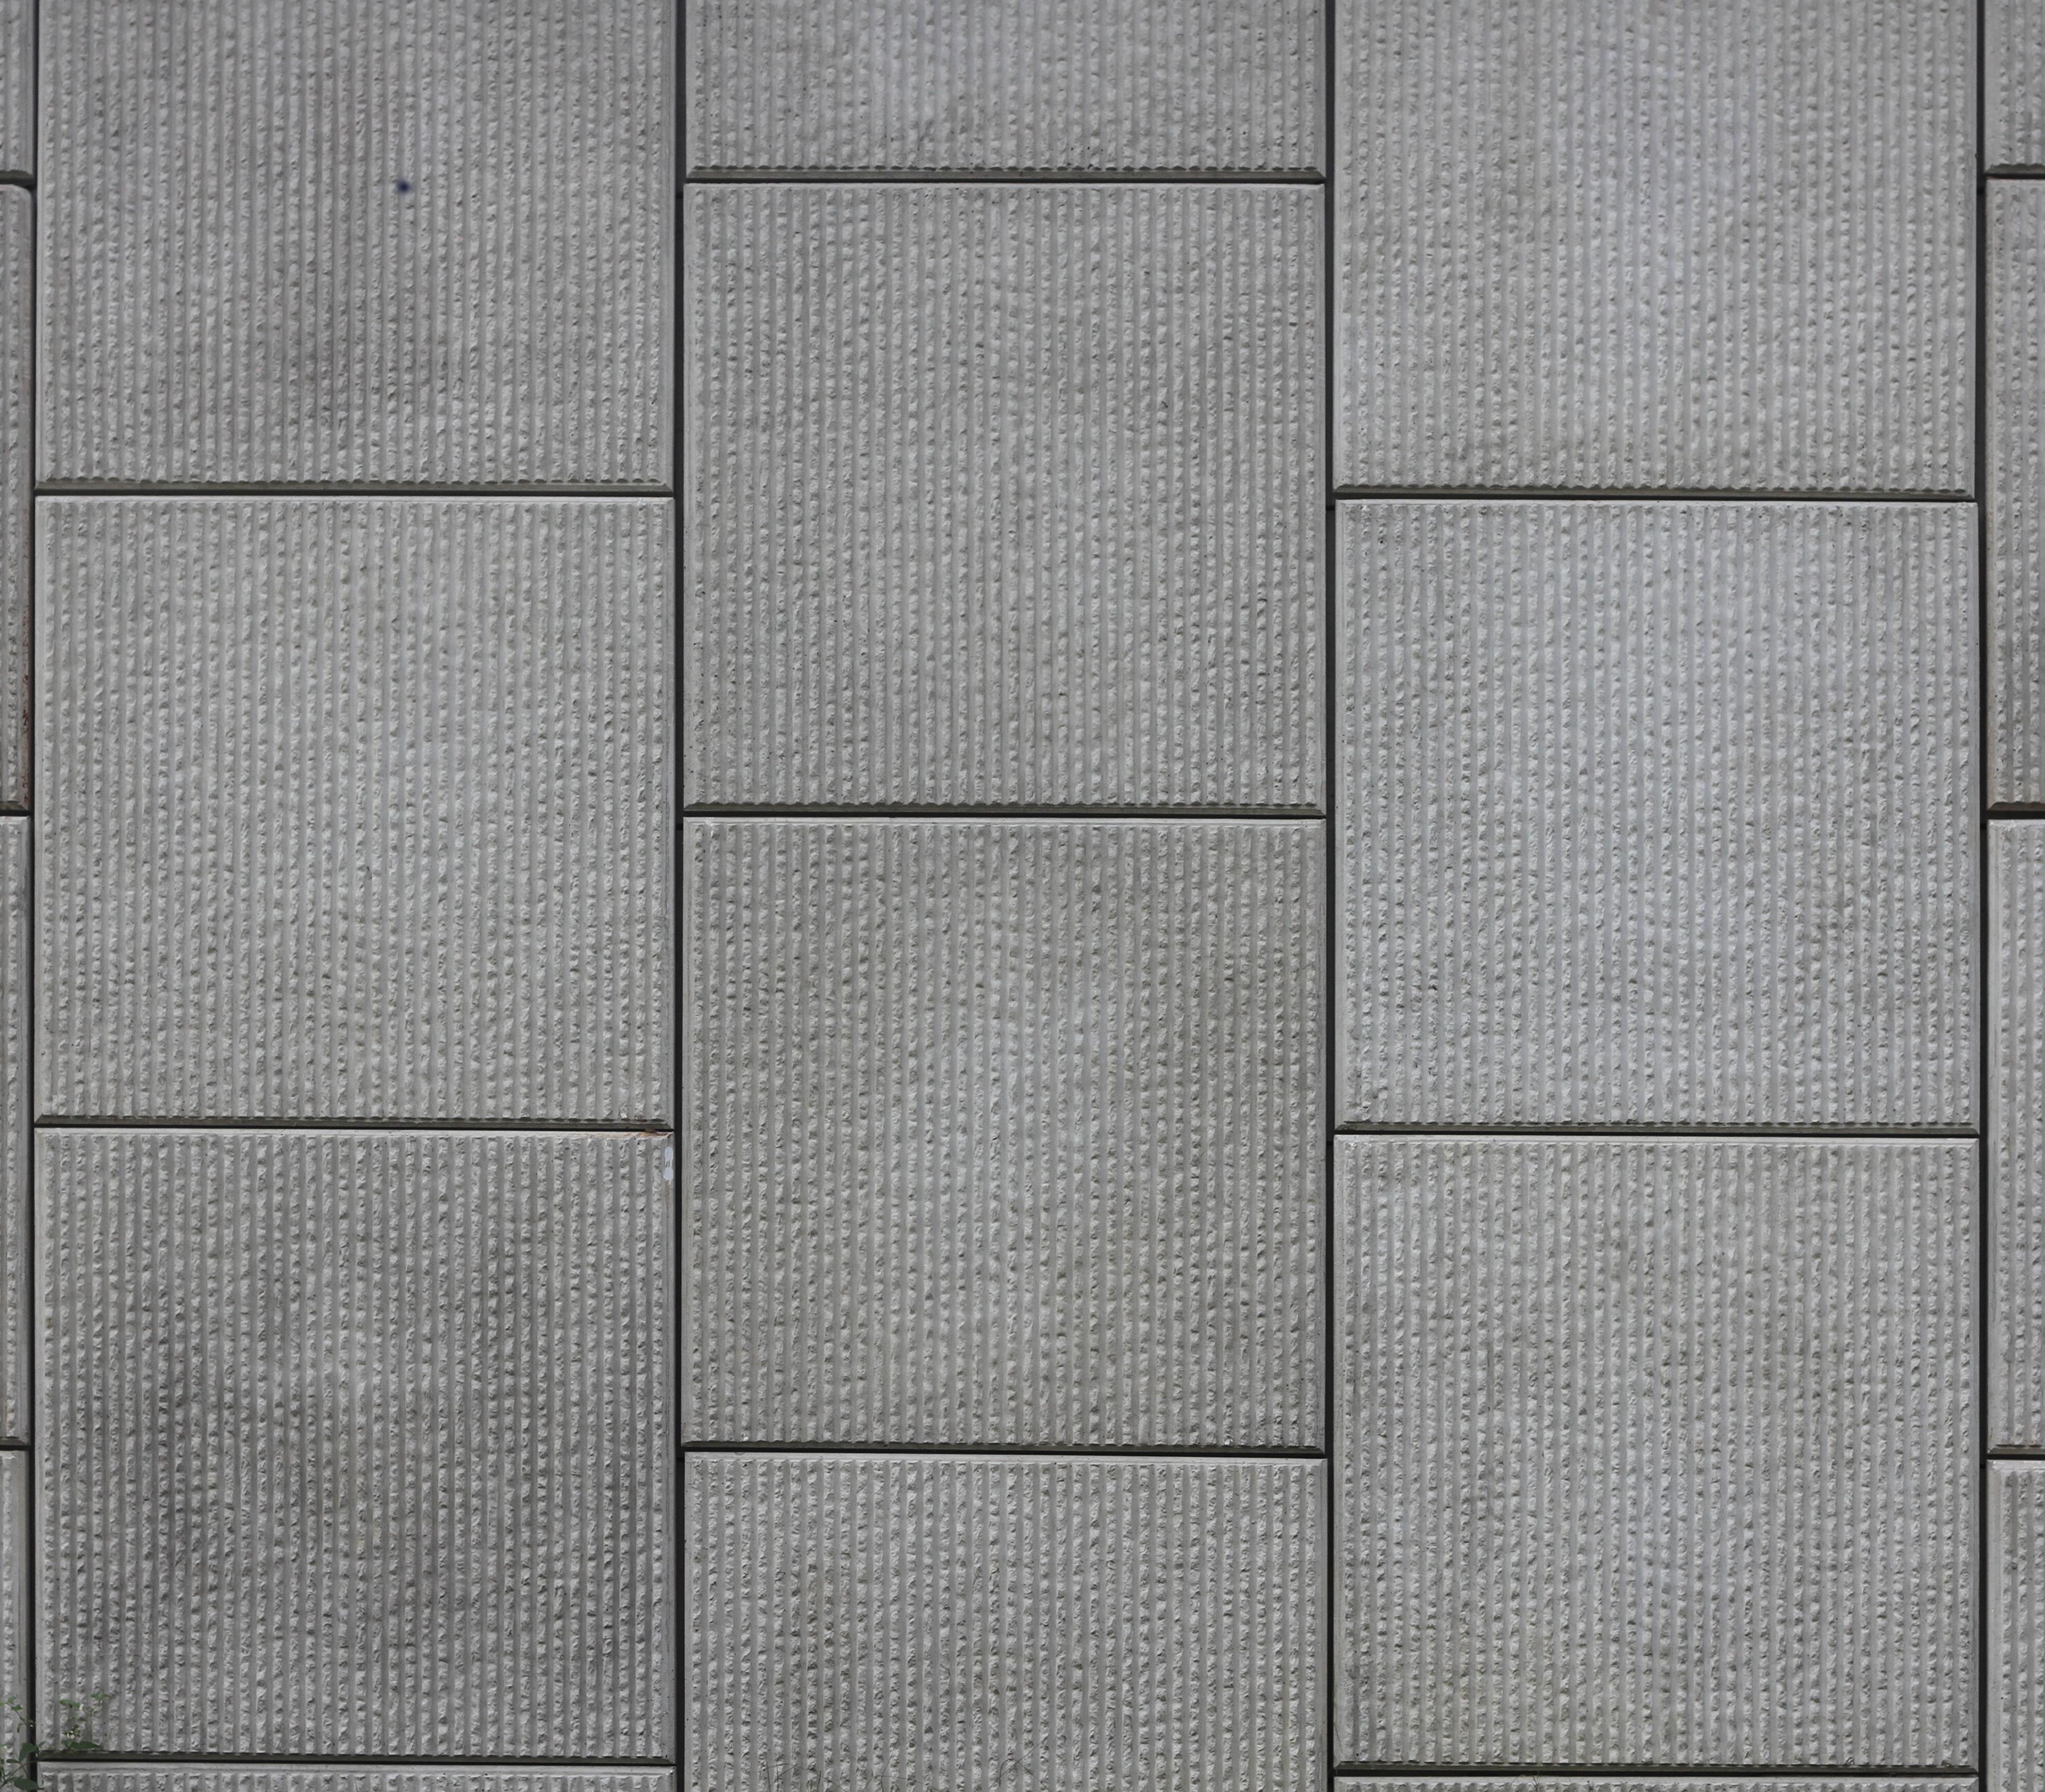 retaining wall texture 2 - 14Textures